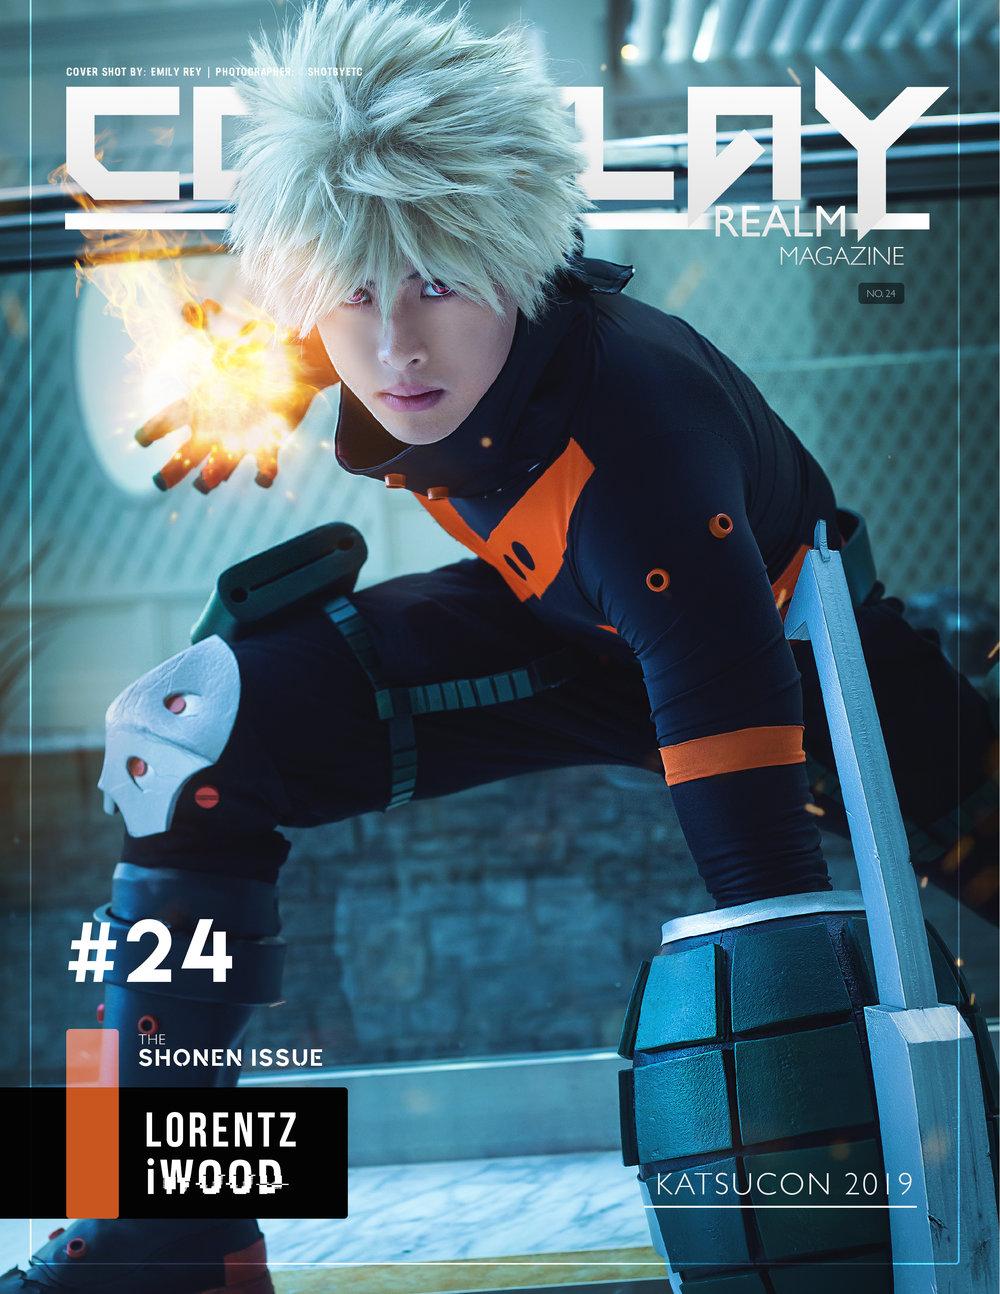 CRM NO. 24 - The Shonen issue